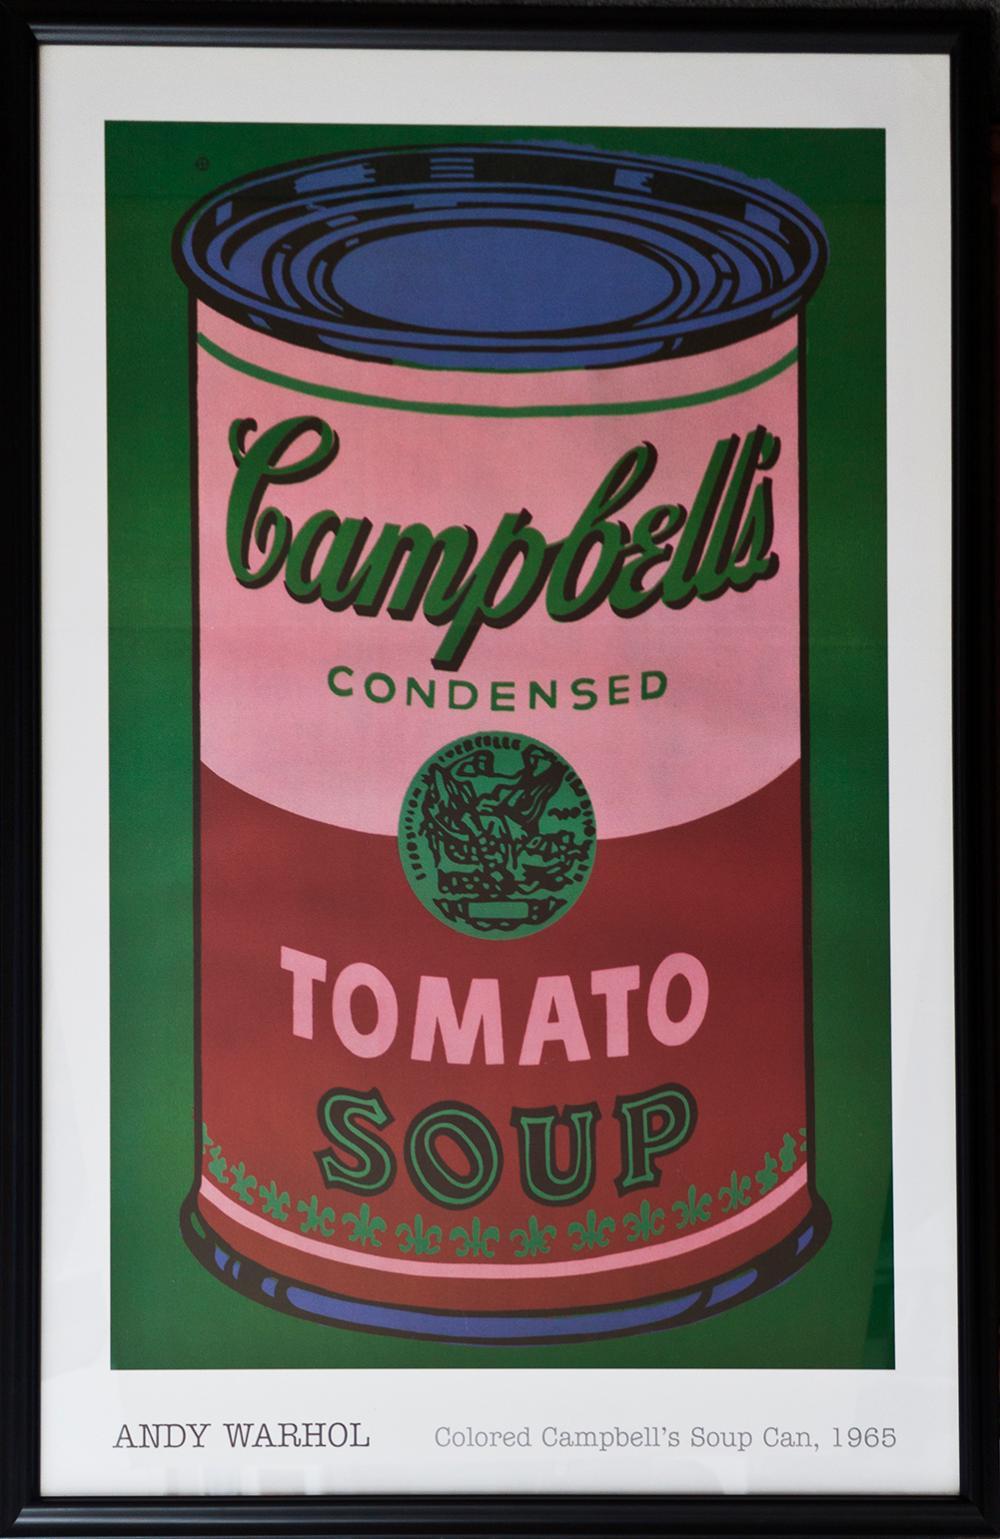 Lot 3173: Andy Warhol Lithograph